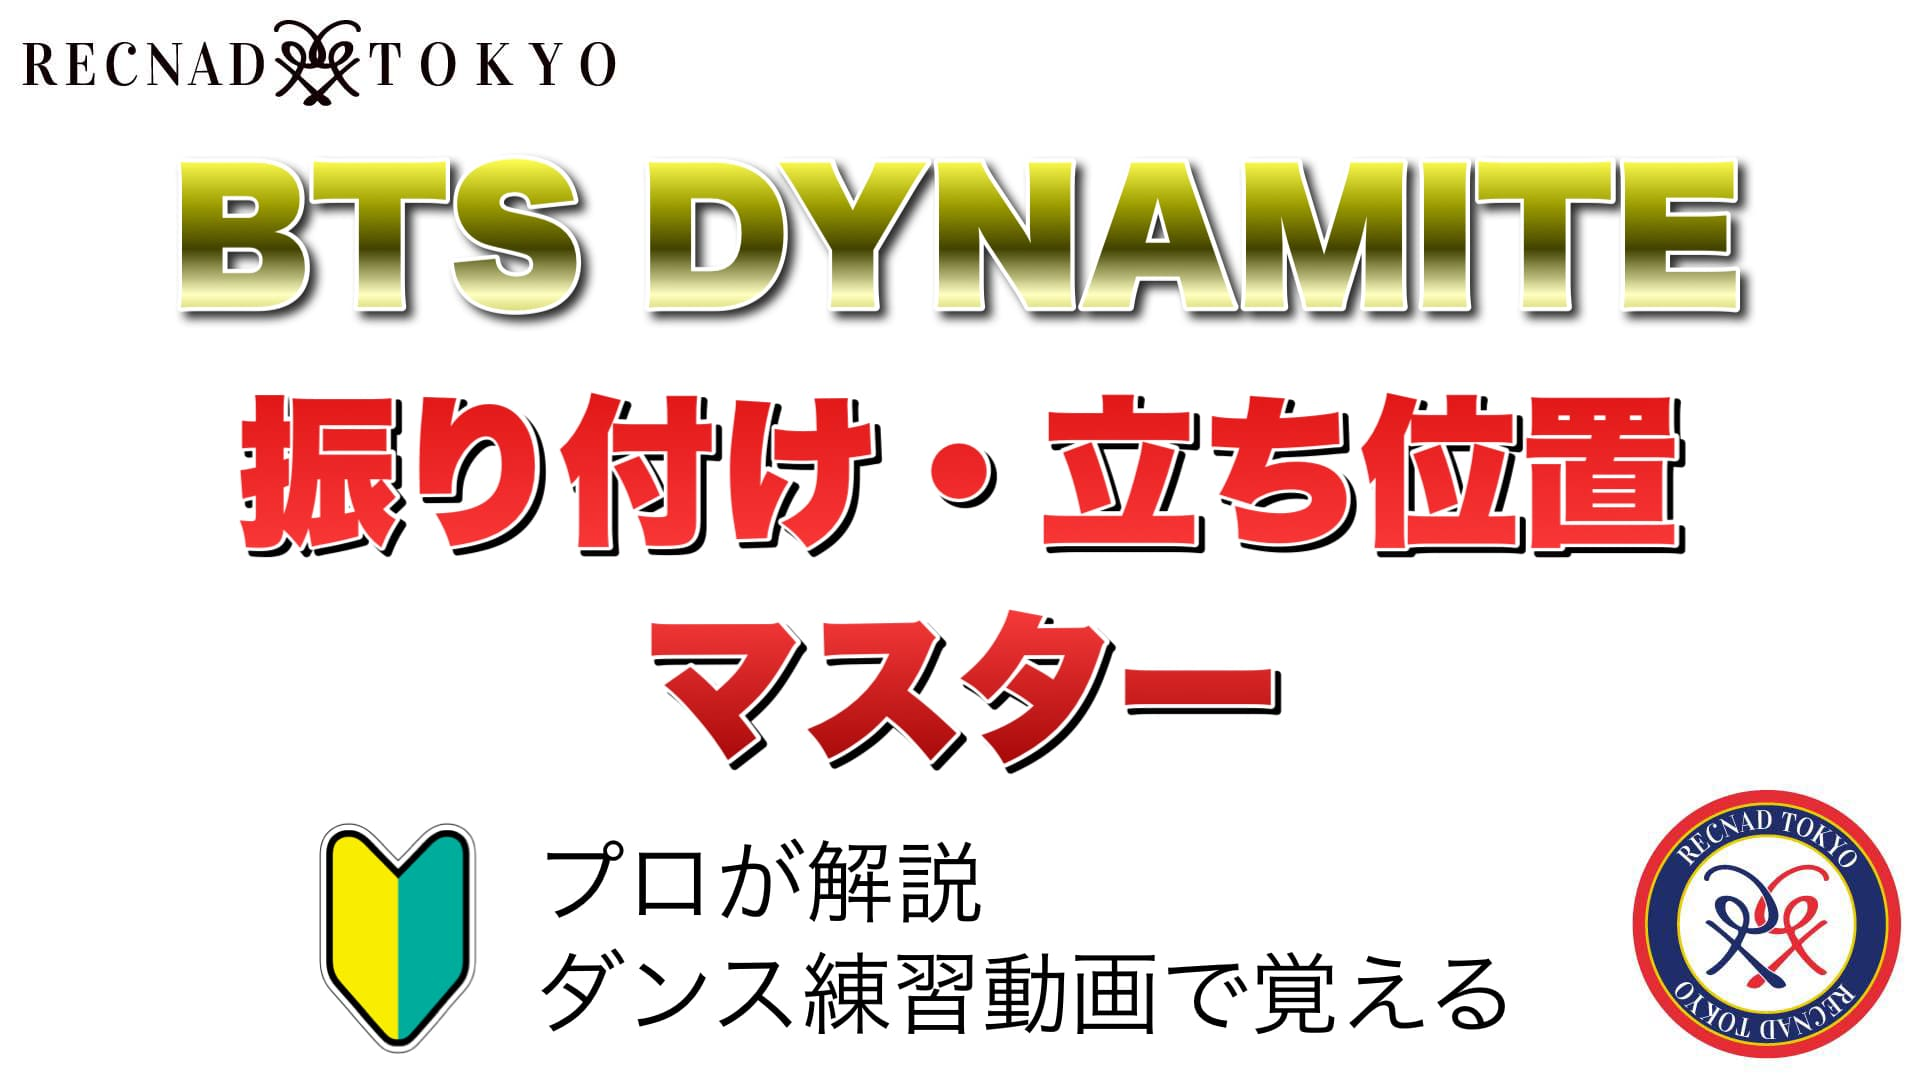 BTS Dynamite プロによる振り付け 構成解説   簡単 ダンス練習動画